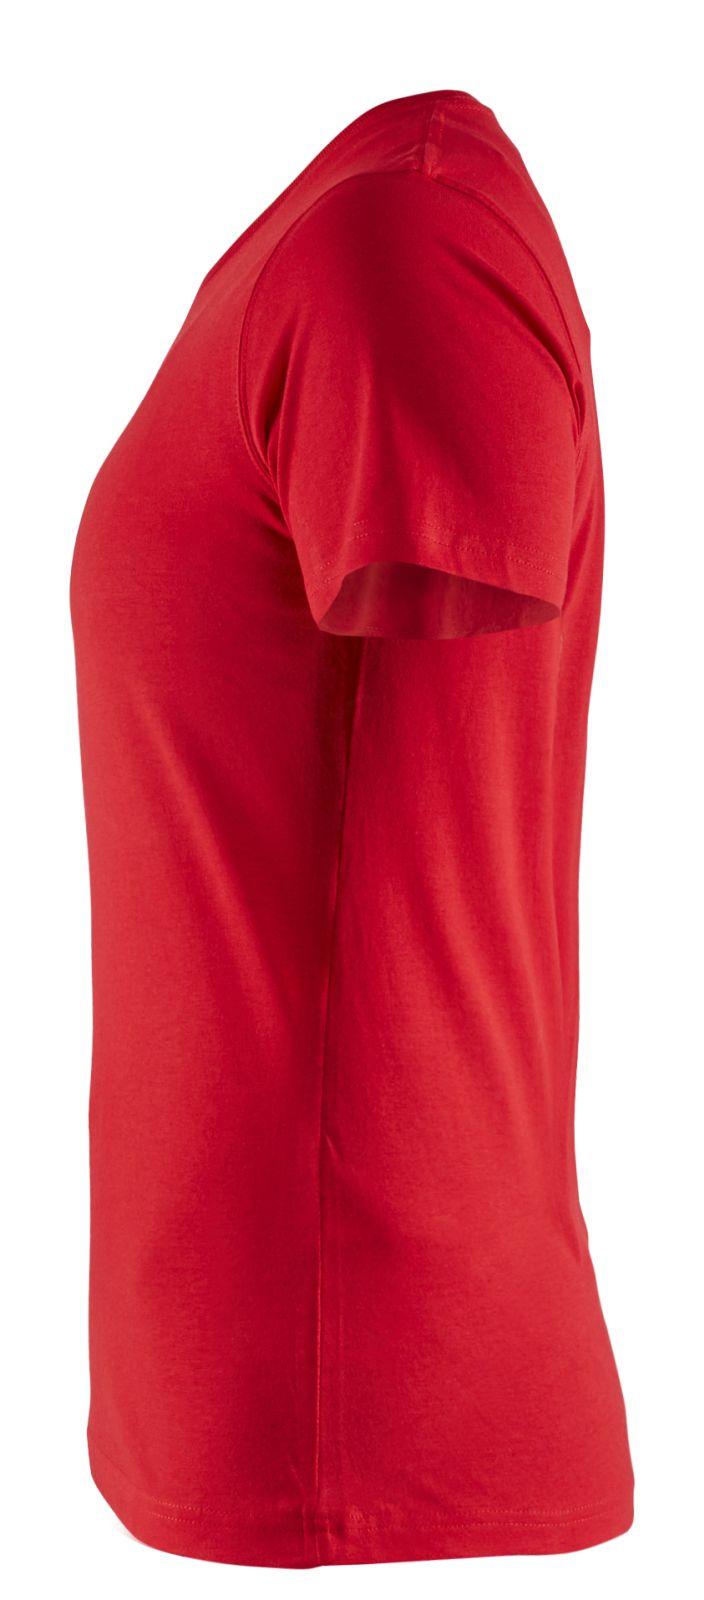 Blaklader T-shirts 33341042 rood(5600)